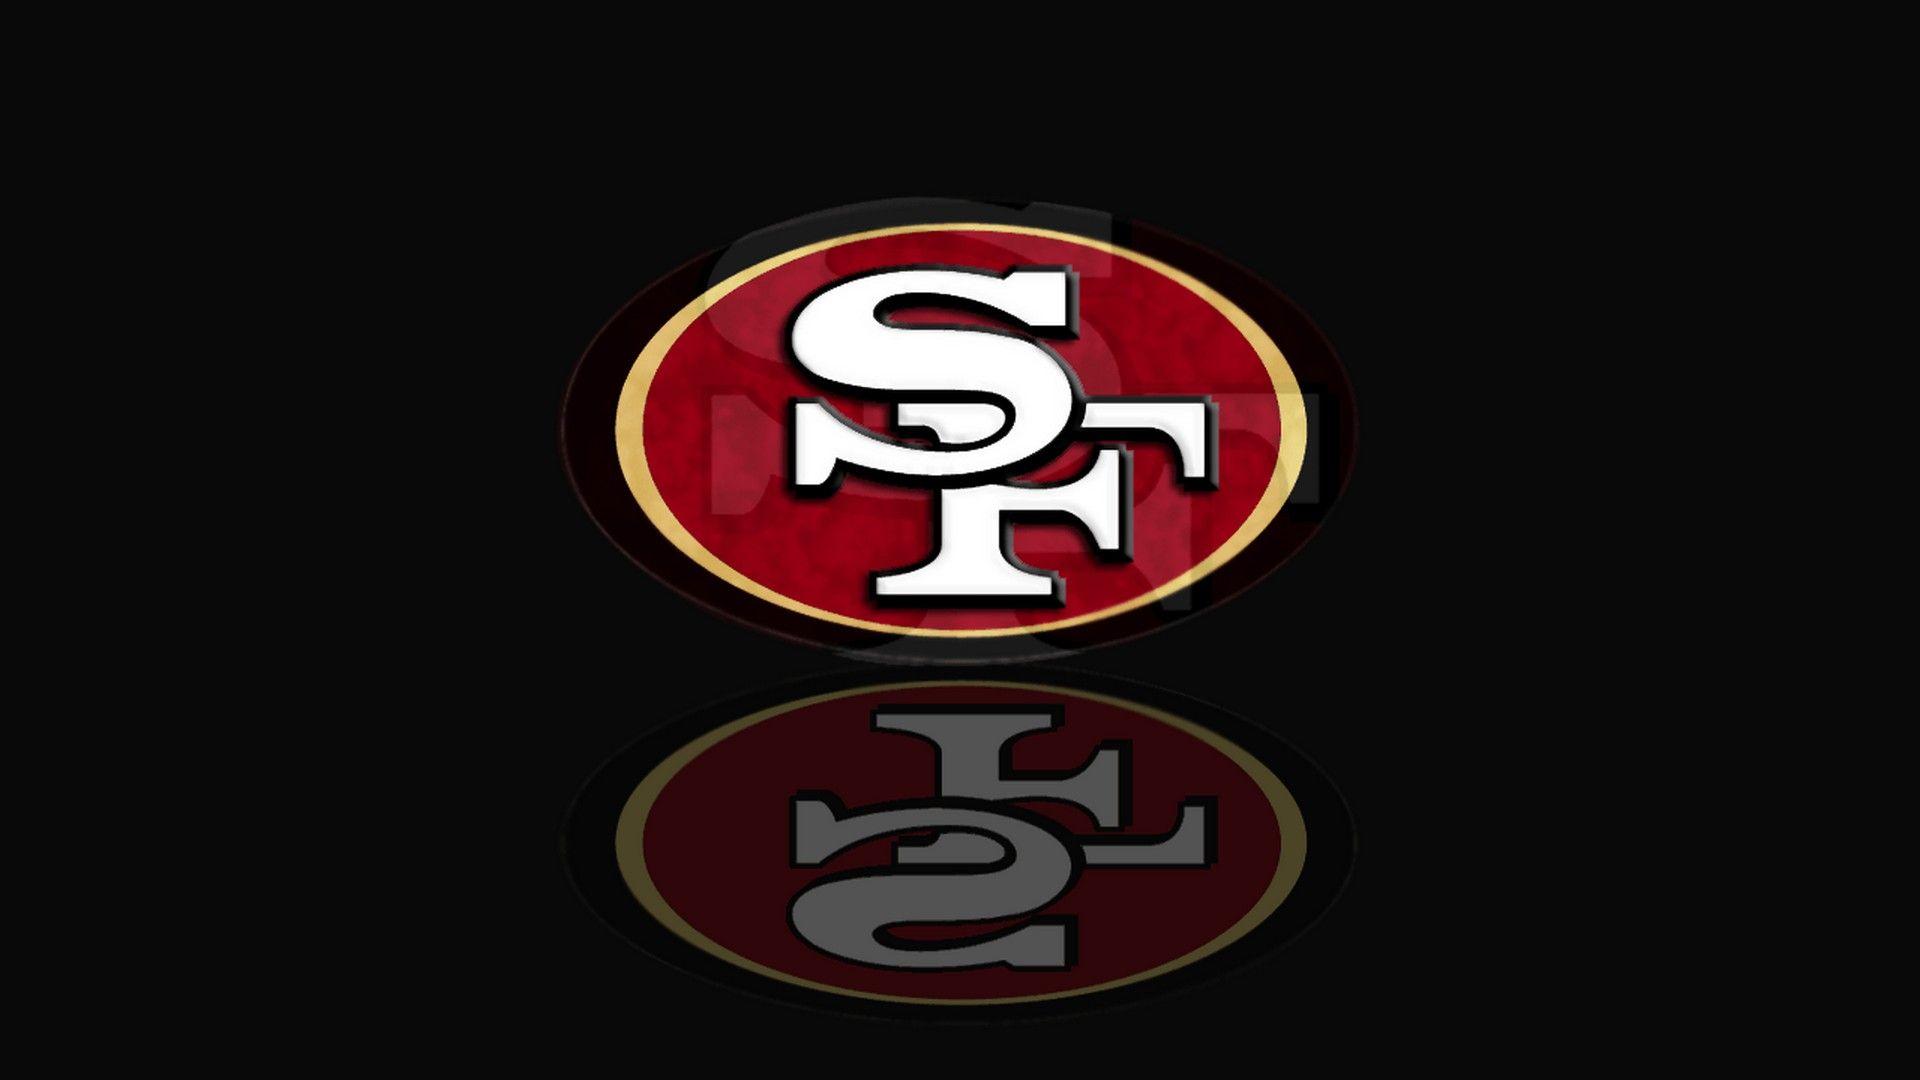 Wallpapers Hd San Francisco 49ers San Francisco 49ers Football